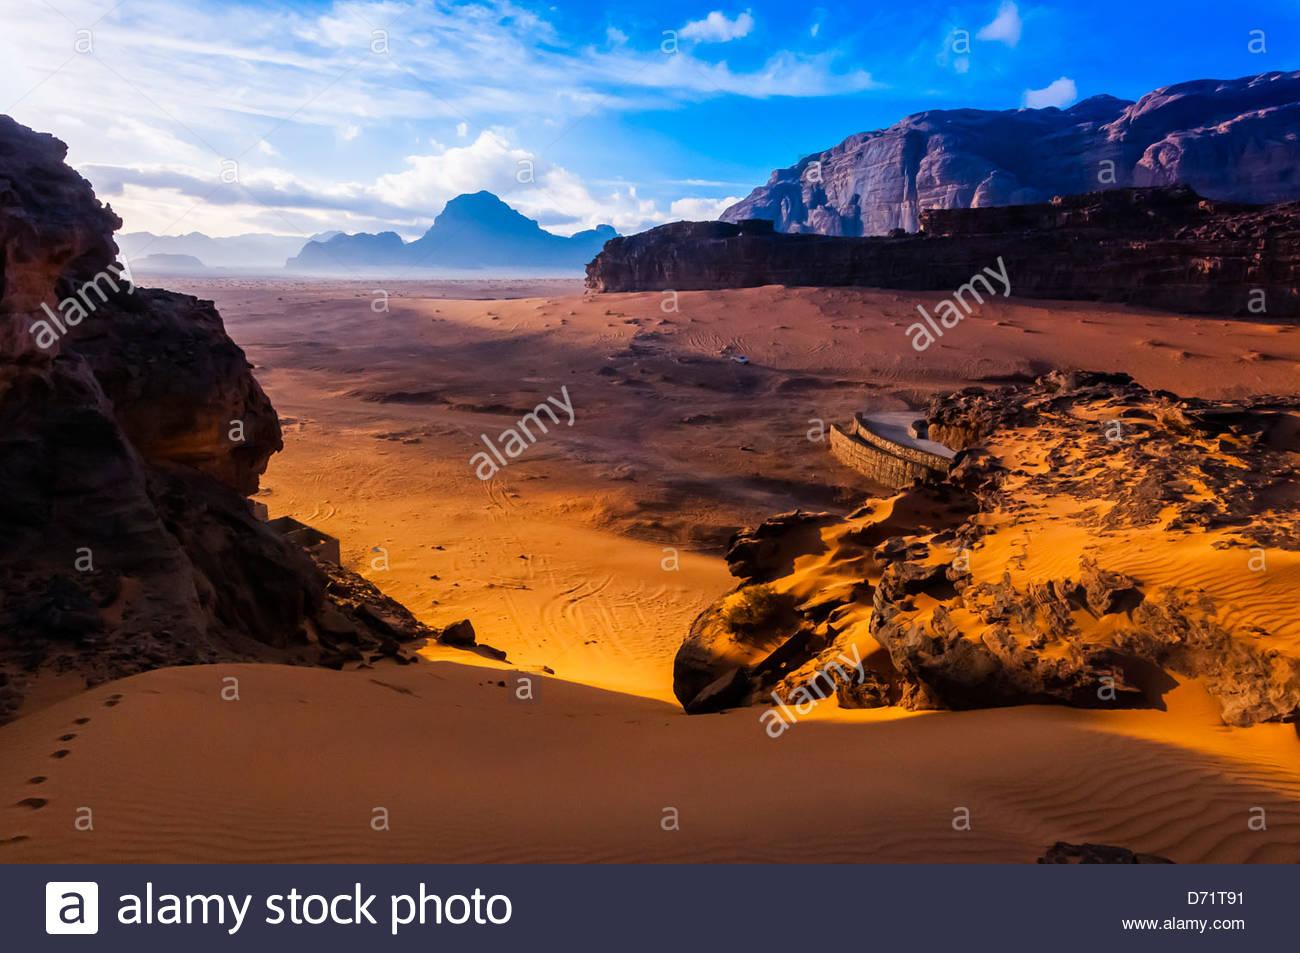 Désert d'Arabie à Wadi Rum, Jordanie. Photo Stock